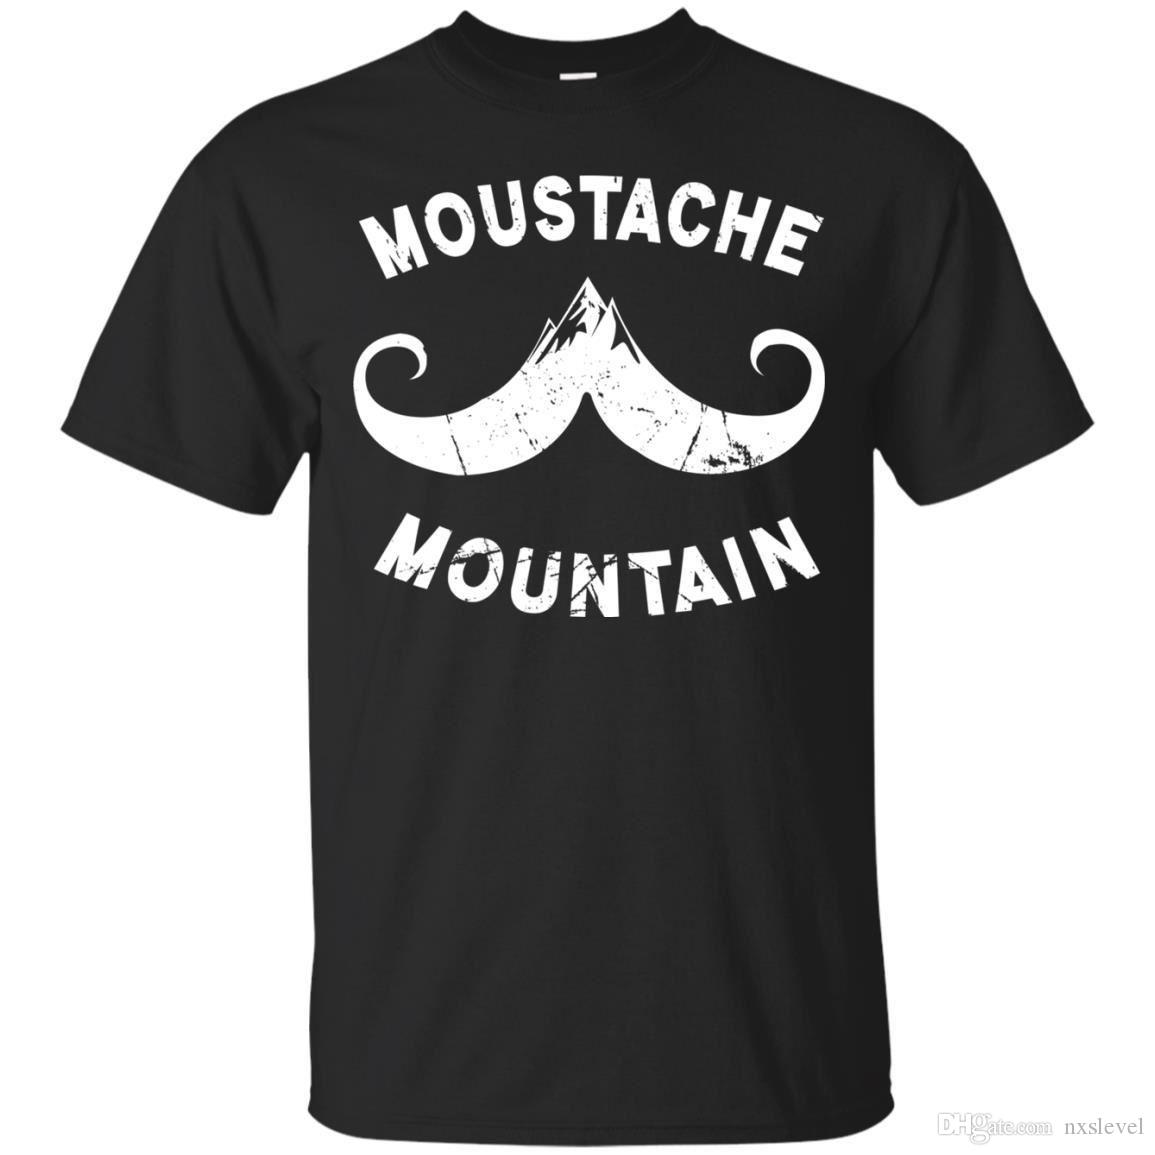 2f12f8361ebc Moustache Mountain T Shirt Mustache Tyler Bate Trent Seven Pete Dunne  British Design Your Own T Shirts Womens Shirt From Nxslevel